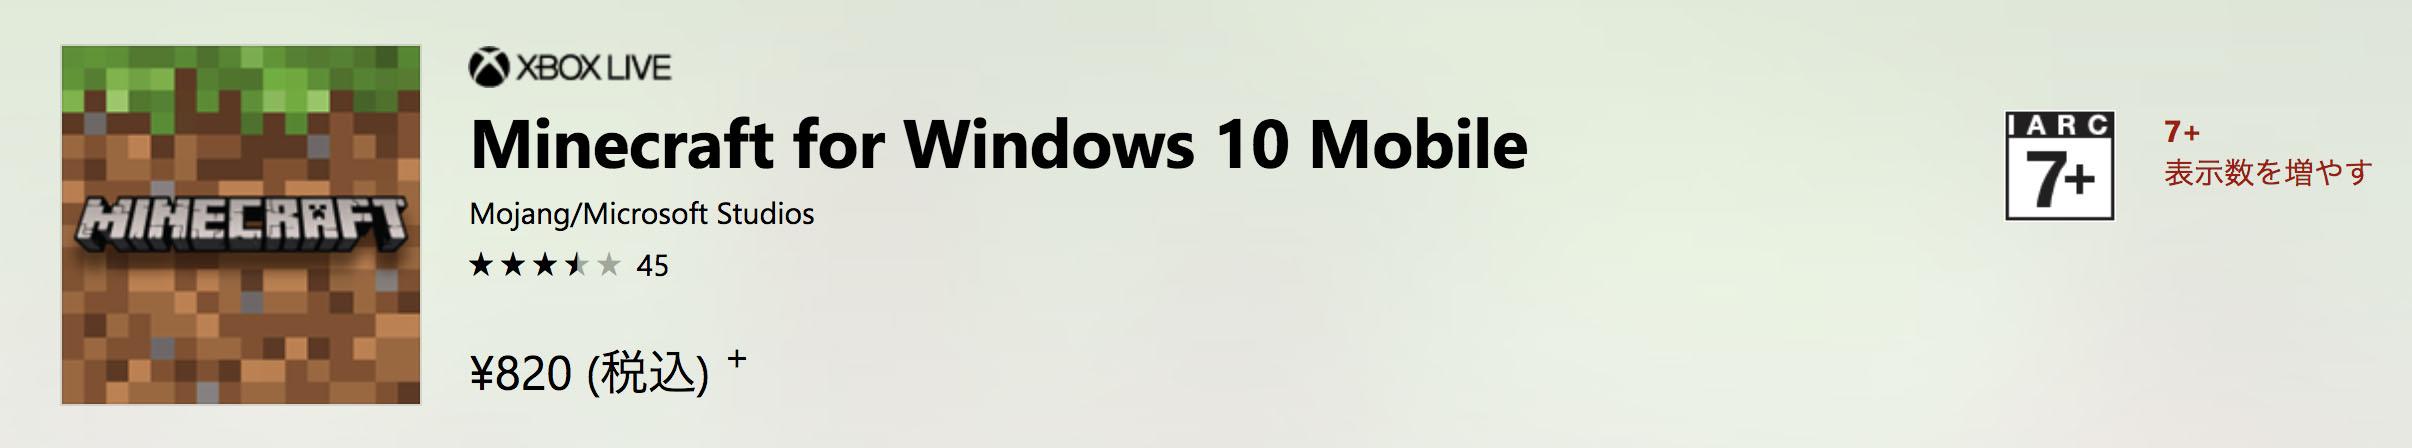 Windows10 Mobileで遊ぶ場合の購入先